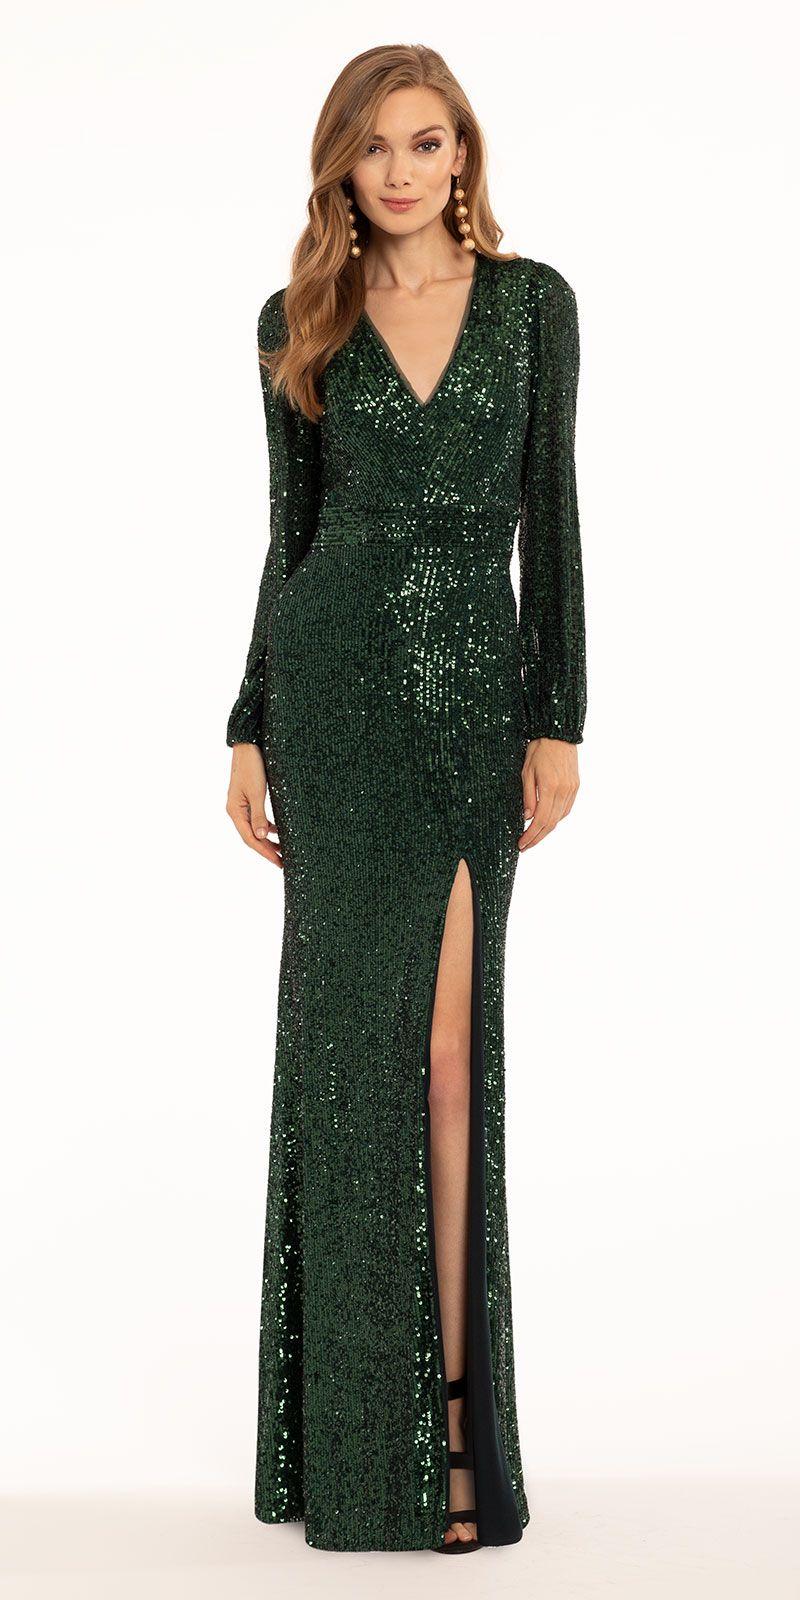 Long Sleeve Sequin Dress Long Sleeve Sequin Dress Black Tie Event Dresses Black Tie Wedding Guest Dress [ 1600 x 800 Pixel ]